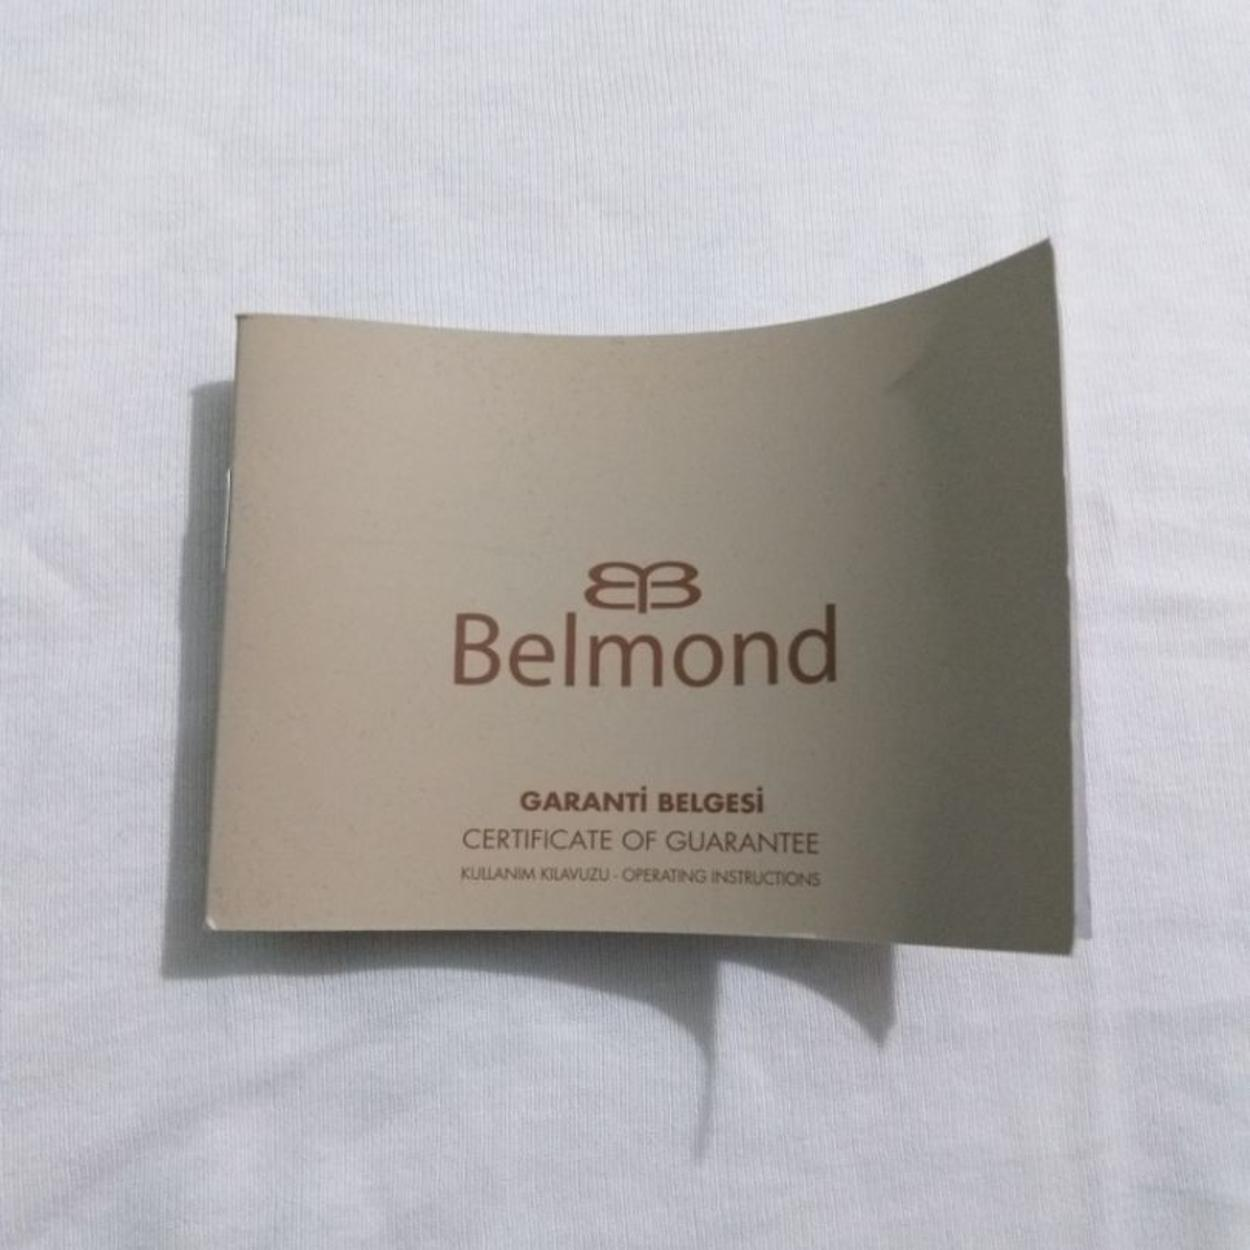 Belmond Saat